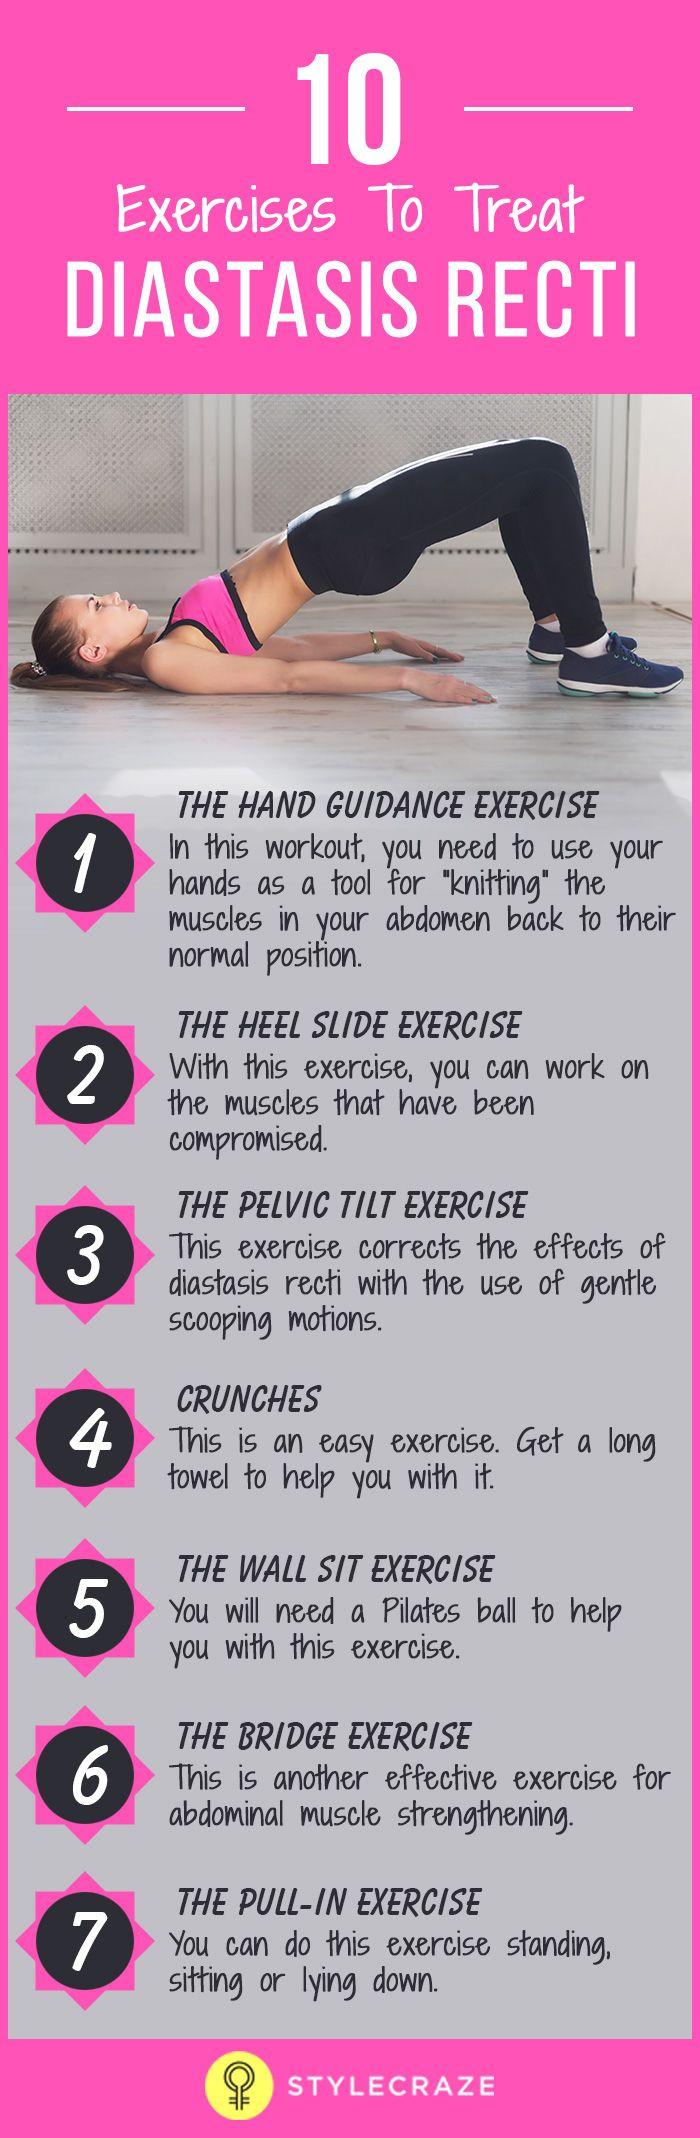 100 Postpartum Health Ideas In 2020 Postpartum Health Exercise Post Partum Workout